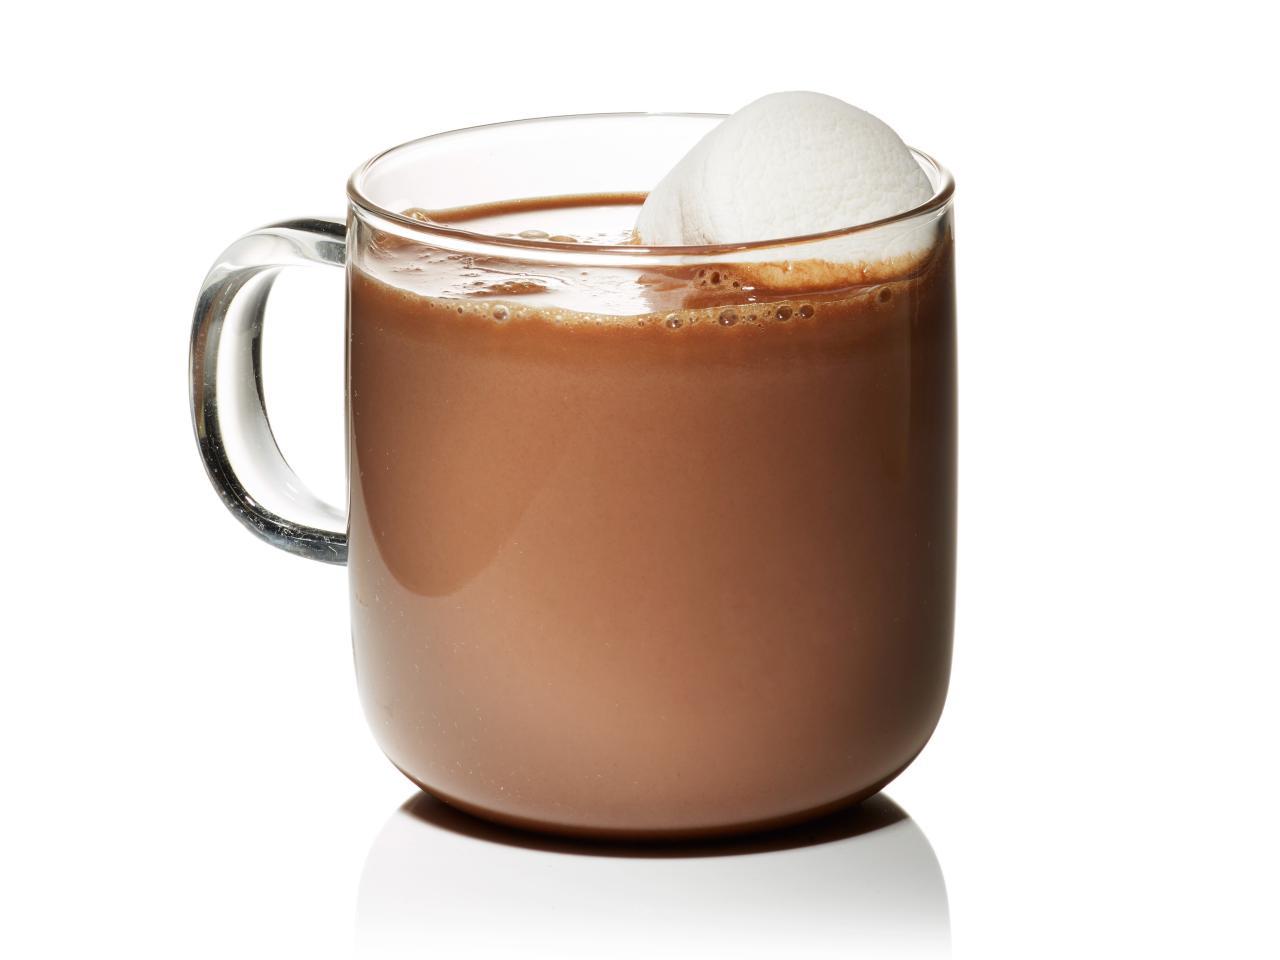 https: img-k.okeinfo.net content 2017 03 27 481 1652506 jangan-terlalu-sering-minum-cokelat-hangat-ini-alasannya-UGWuMDuu5Y.jpeg